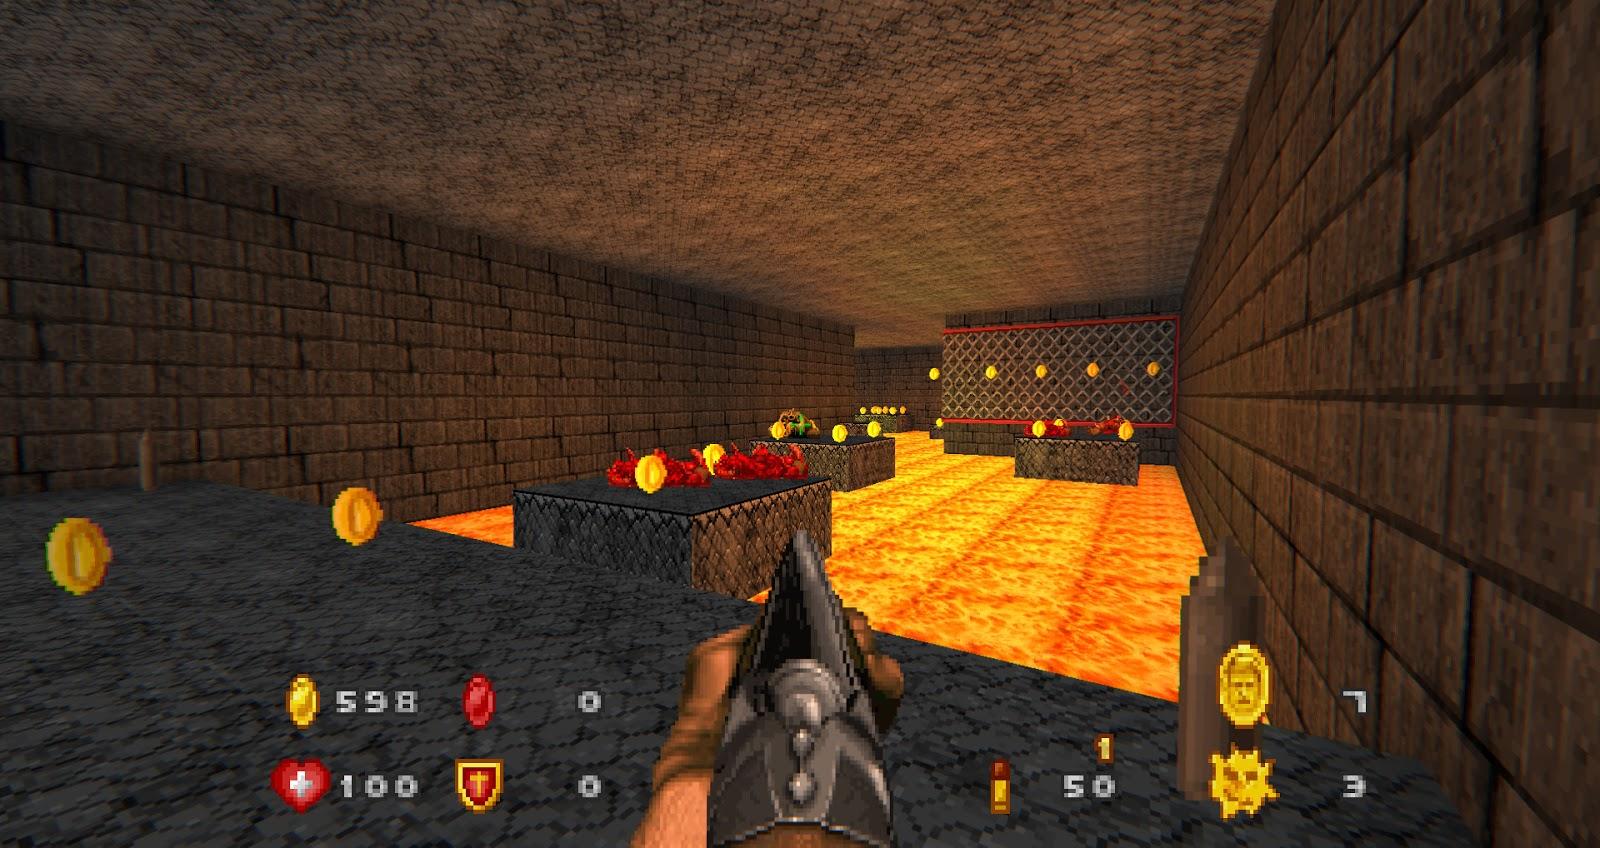 Review - DOOM + THE GOLDEN SOULS v1 4 - Plumber with a shotgun